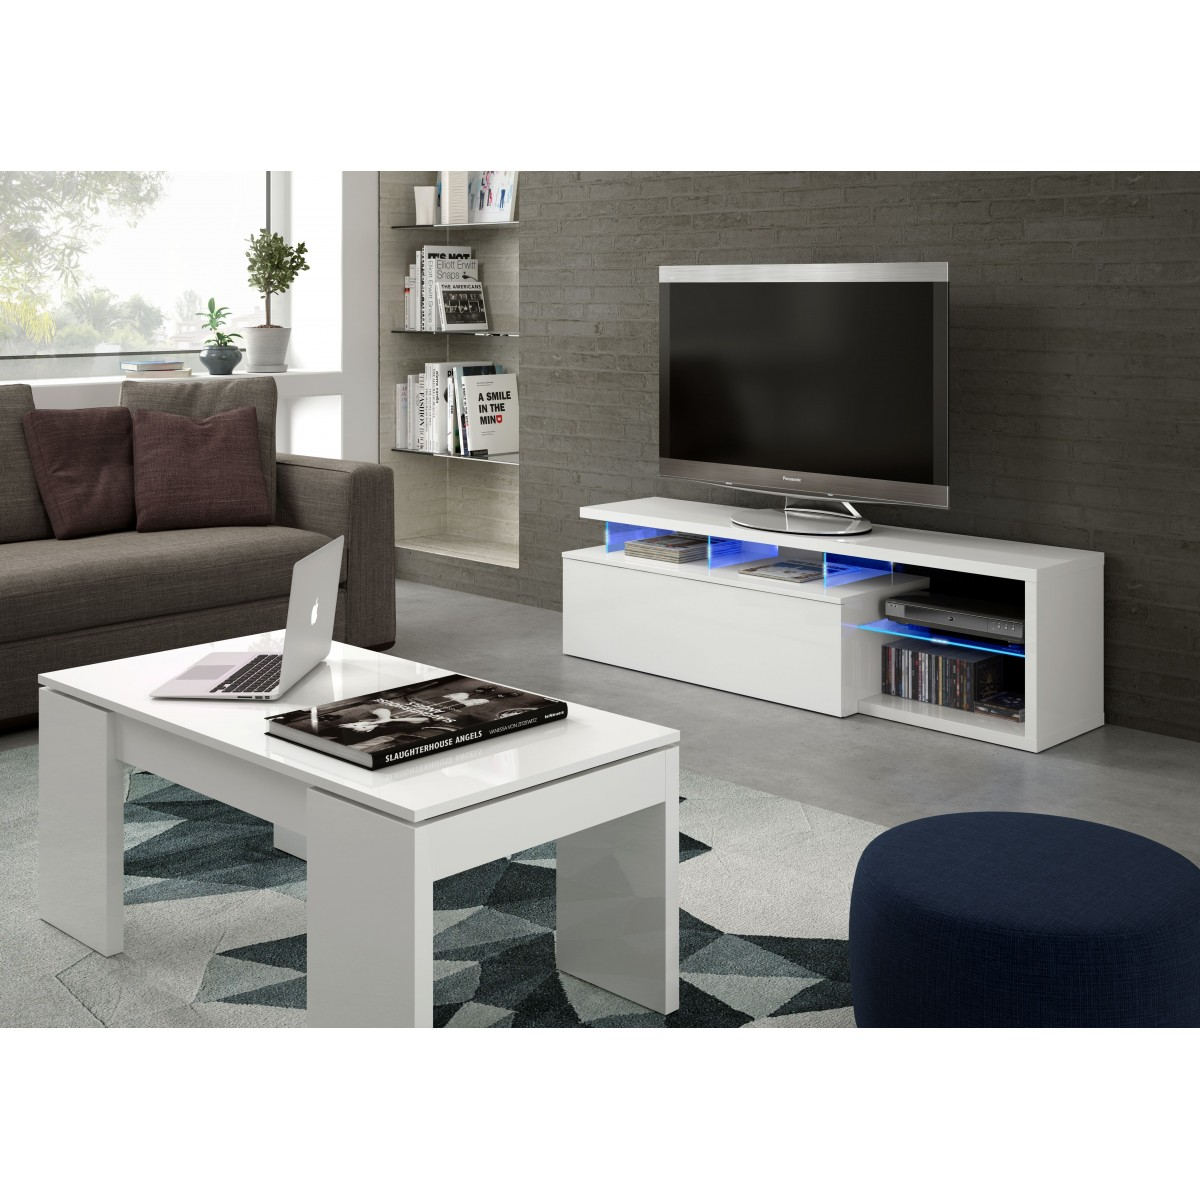 Muebles con leds mueble de saln medeo roble sonoma leds for Cocinas alfa bogota